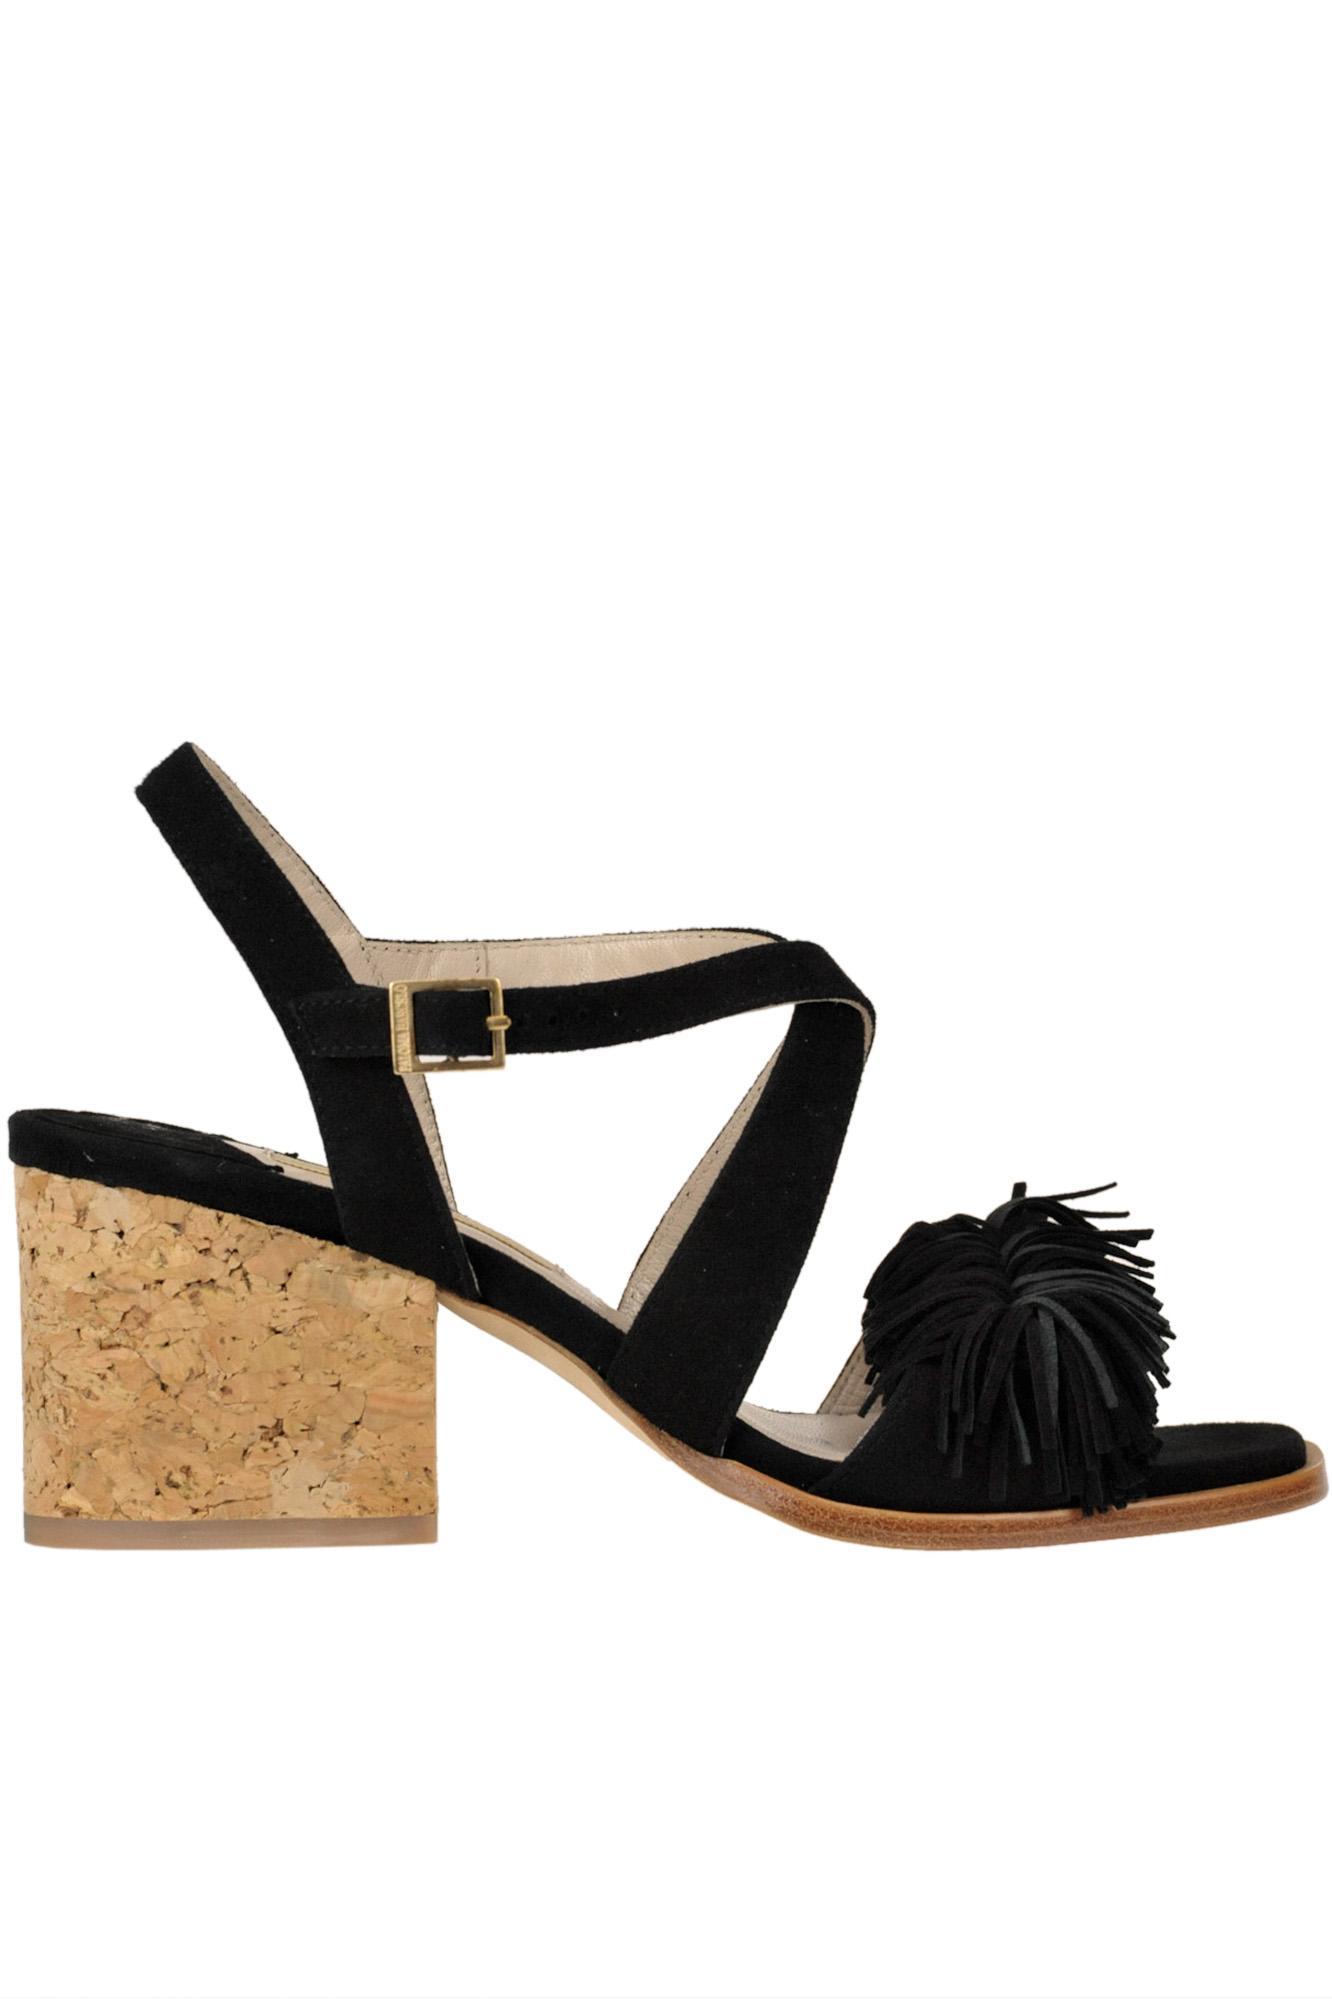 1730e6067abd Lyst - Paloma Barceló  neville  Suede Sandals in Black - Save 66%